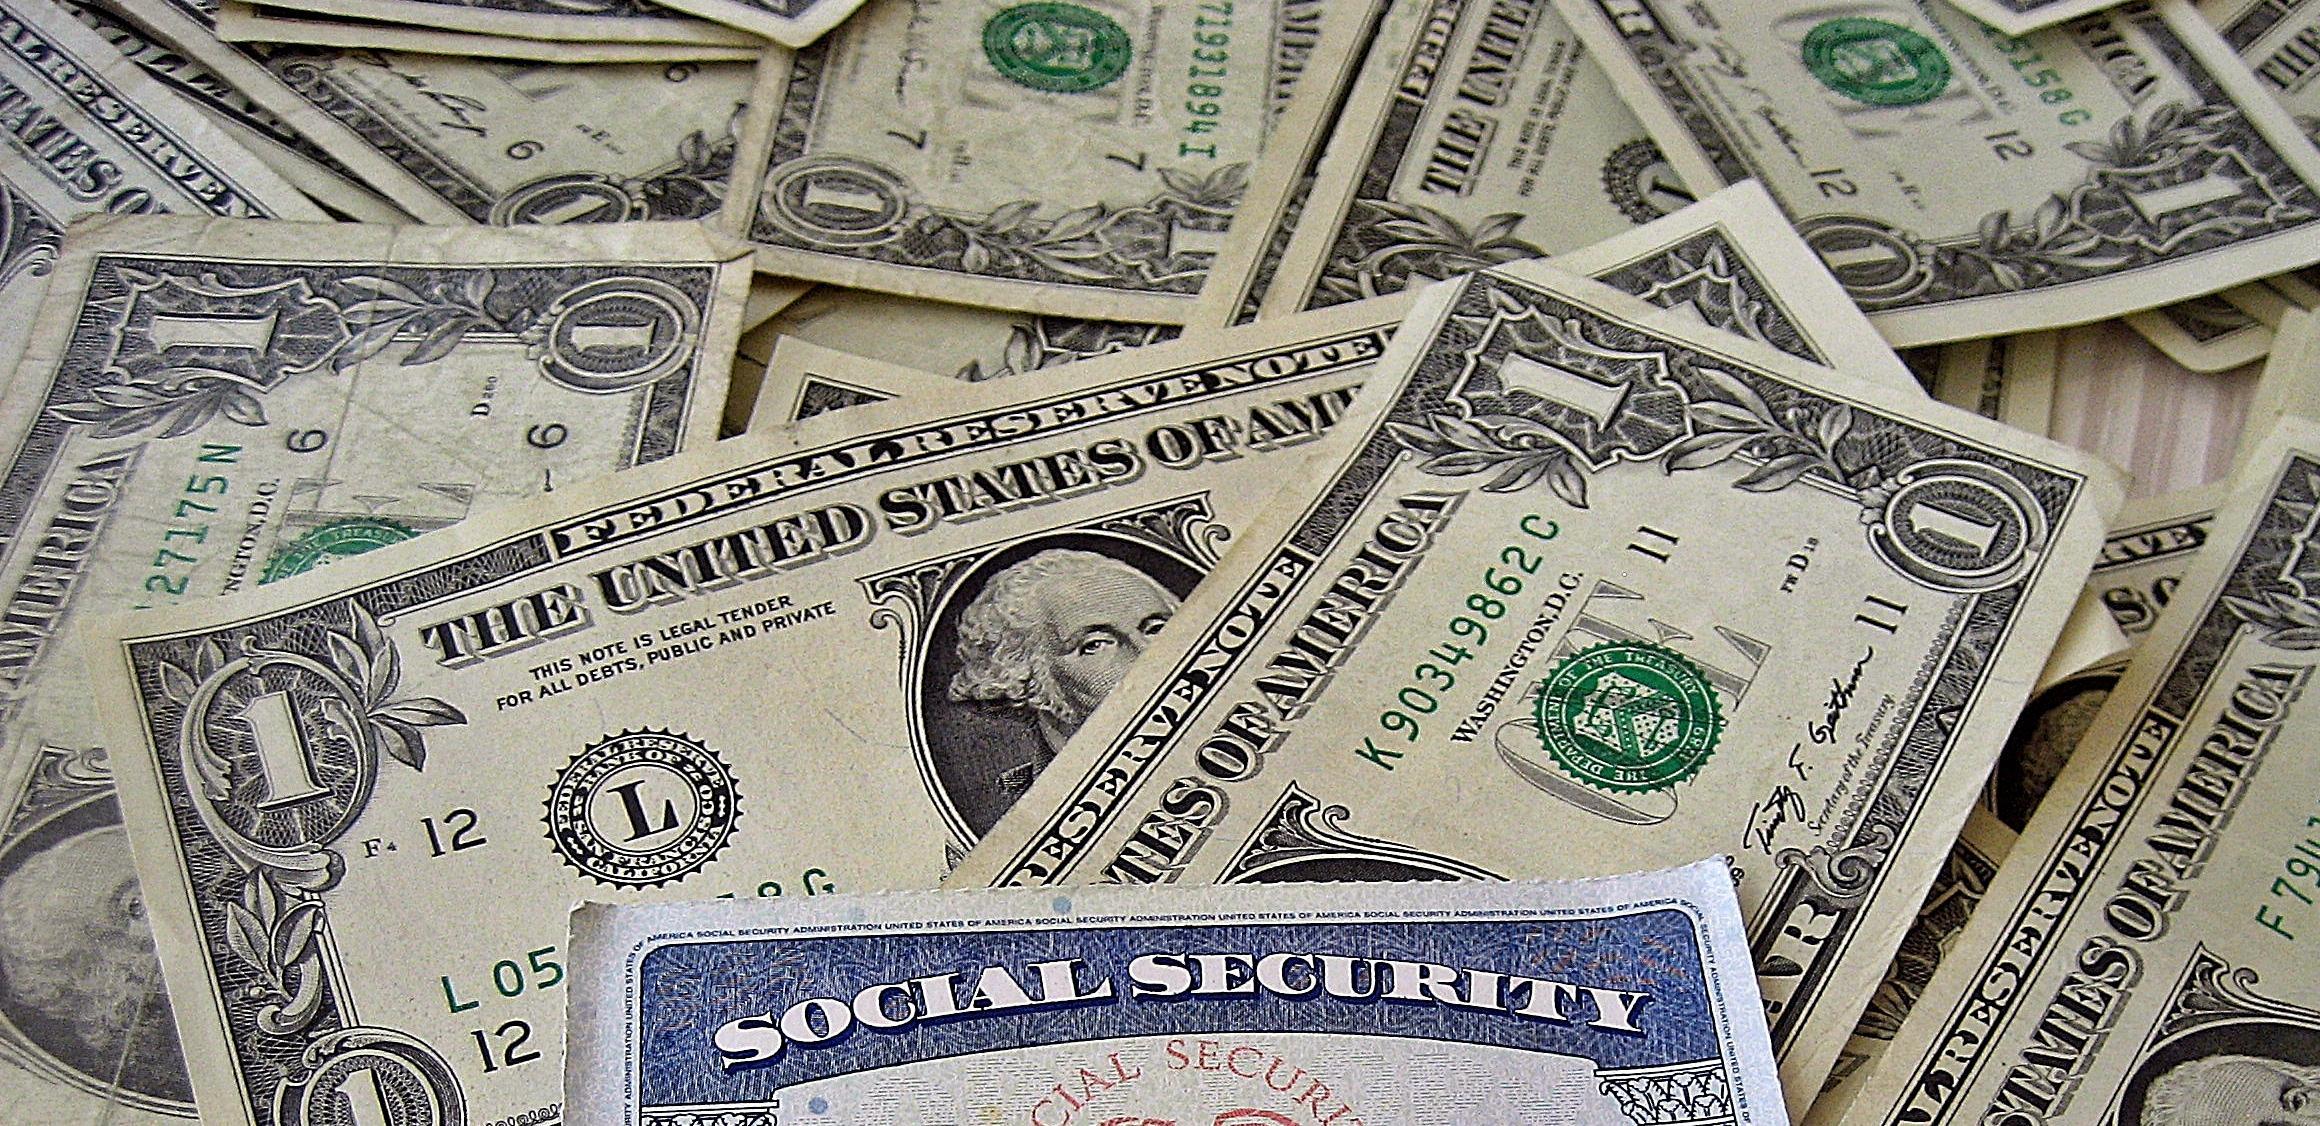 social security card on dollar bills